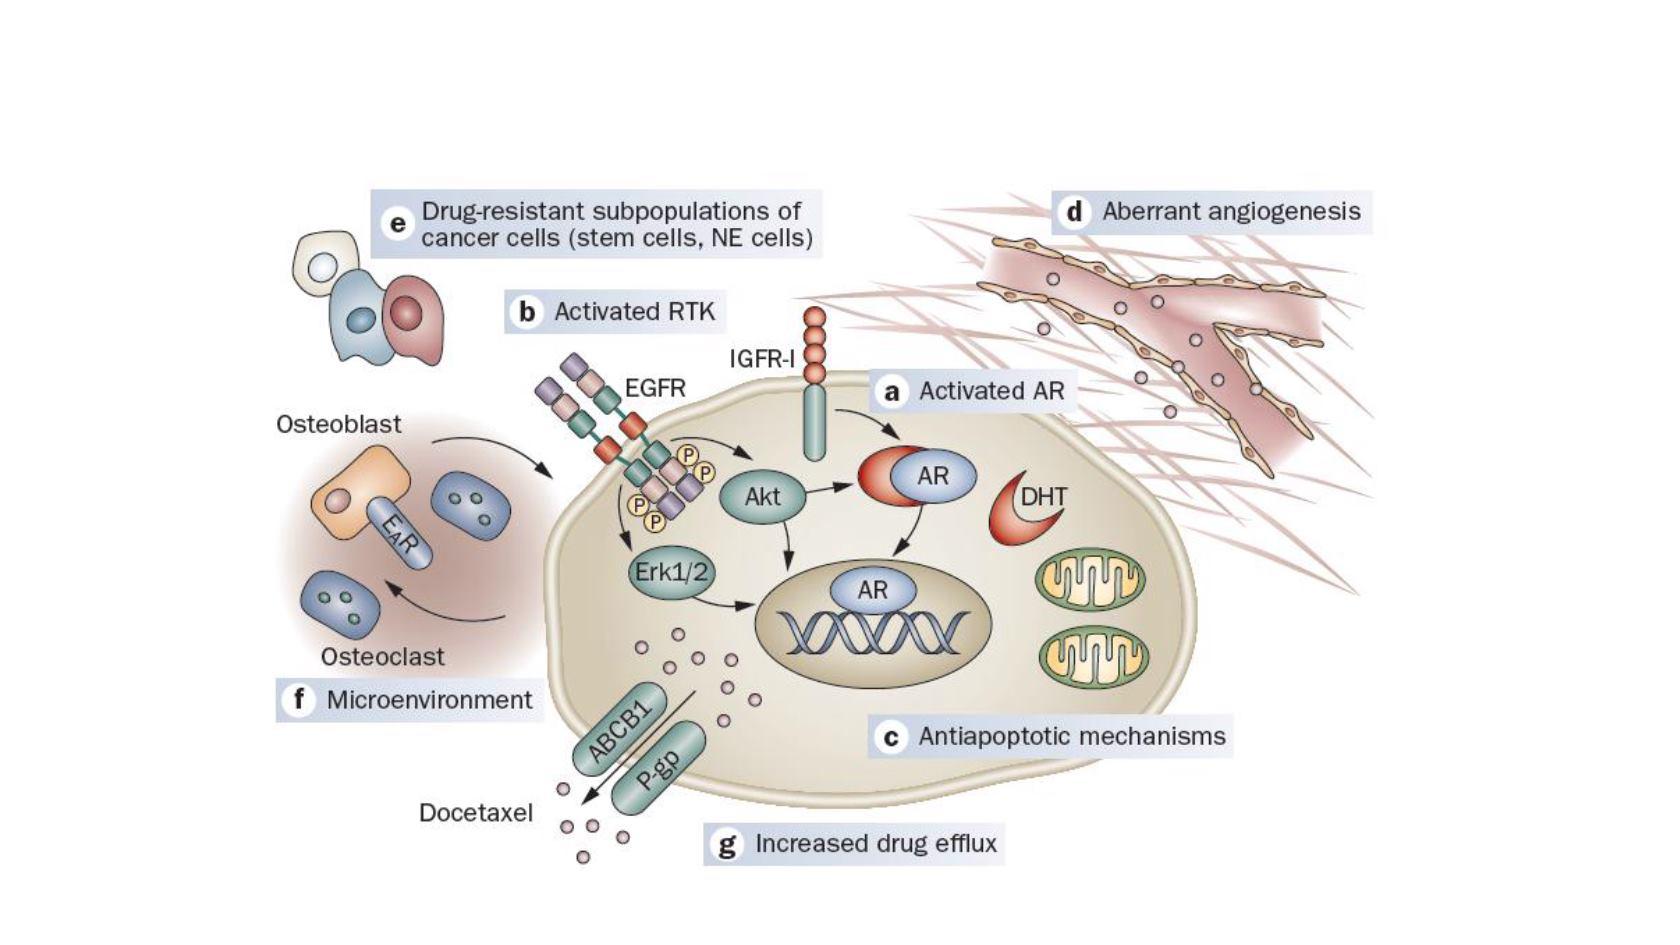 diapositiva de cáncer de próstata